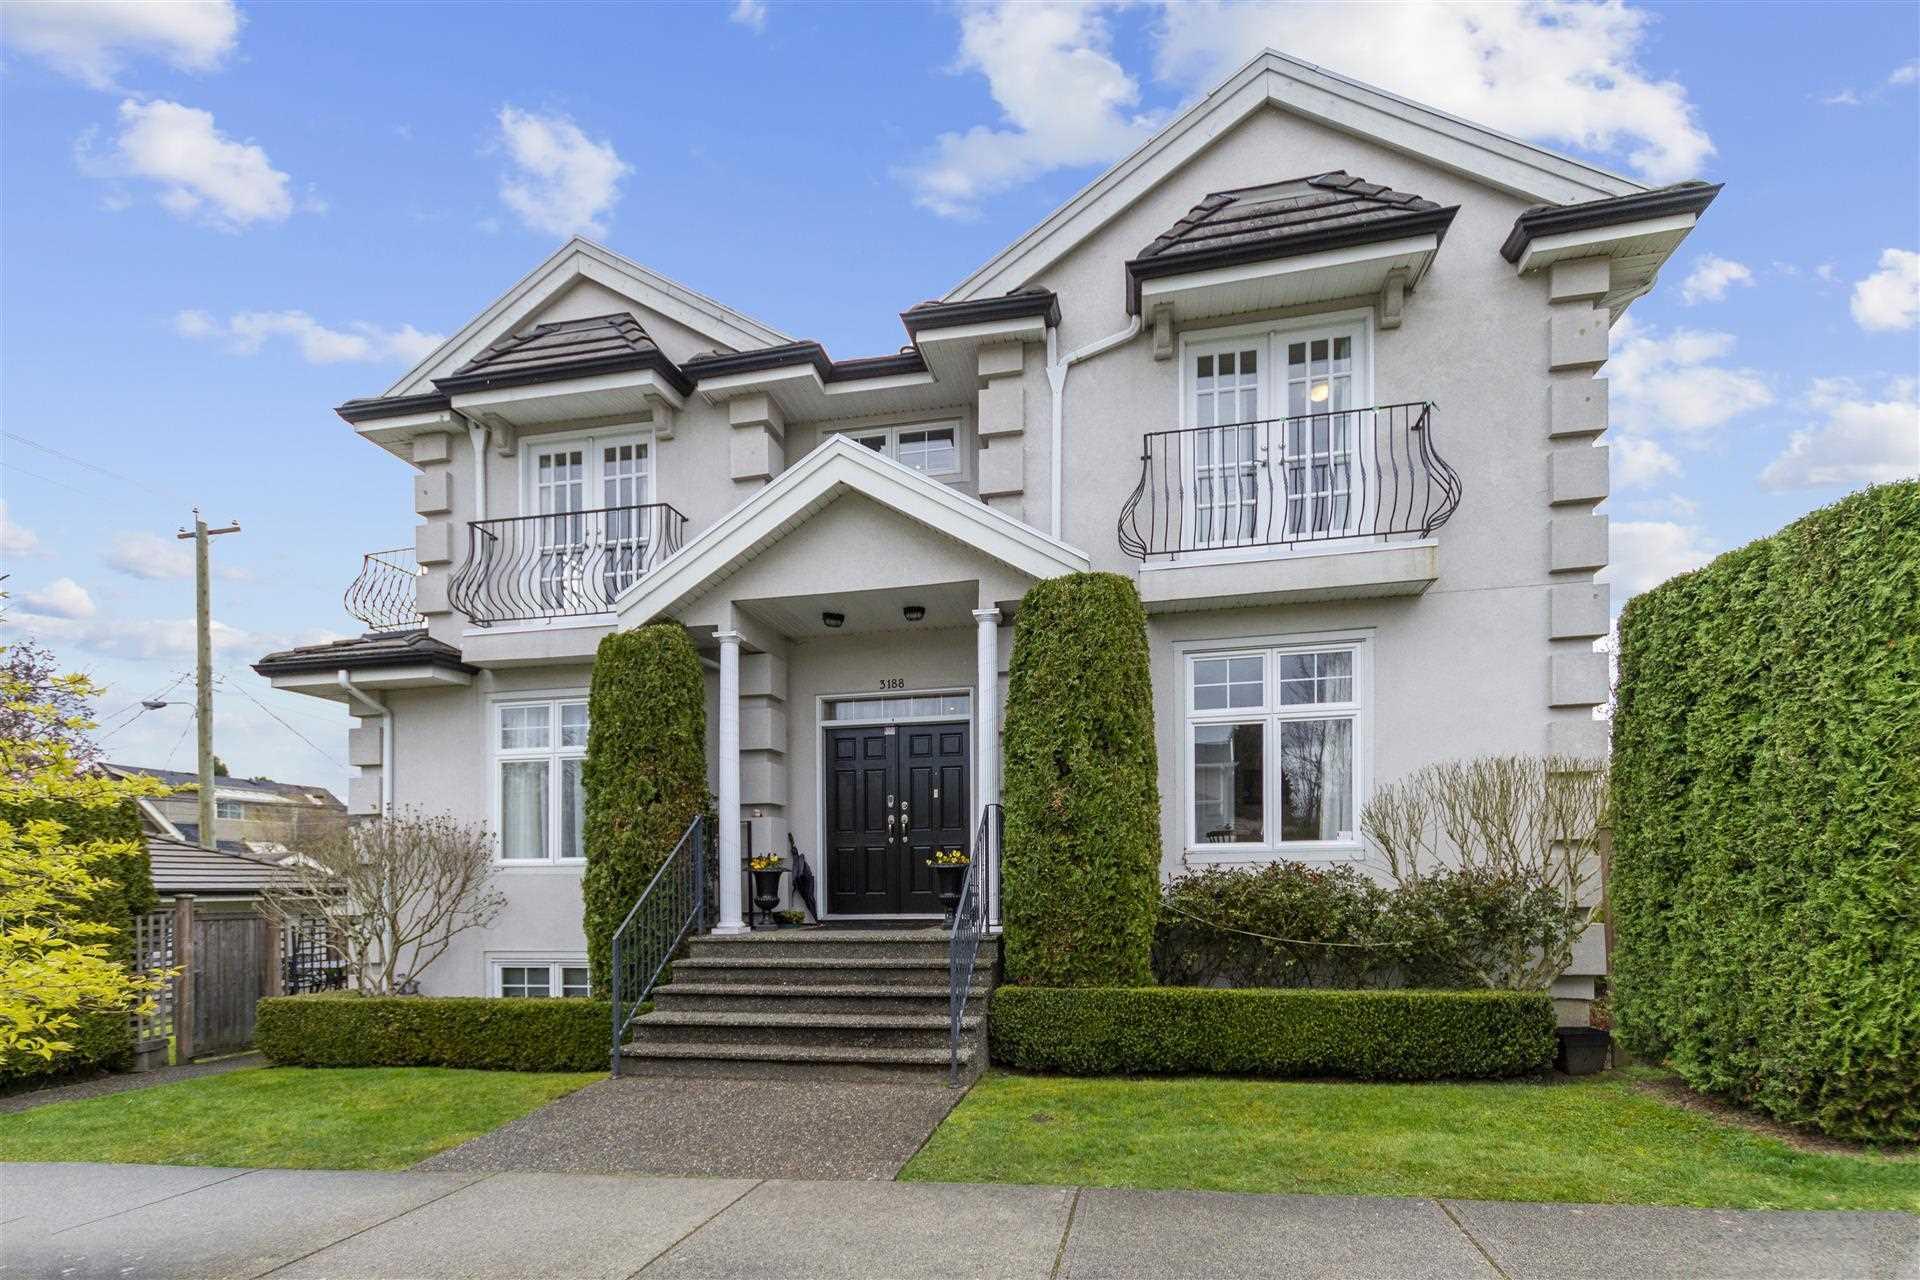 3188 VINE STREET - Kitsilano House/Single Family for sale, 8 Bedrooms (R2604999)